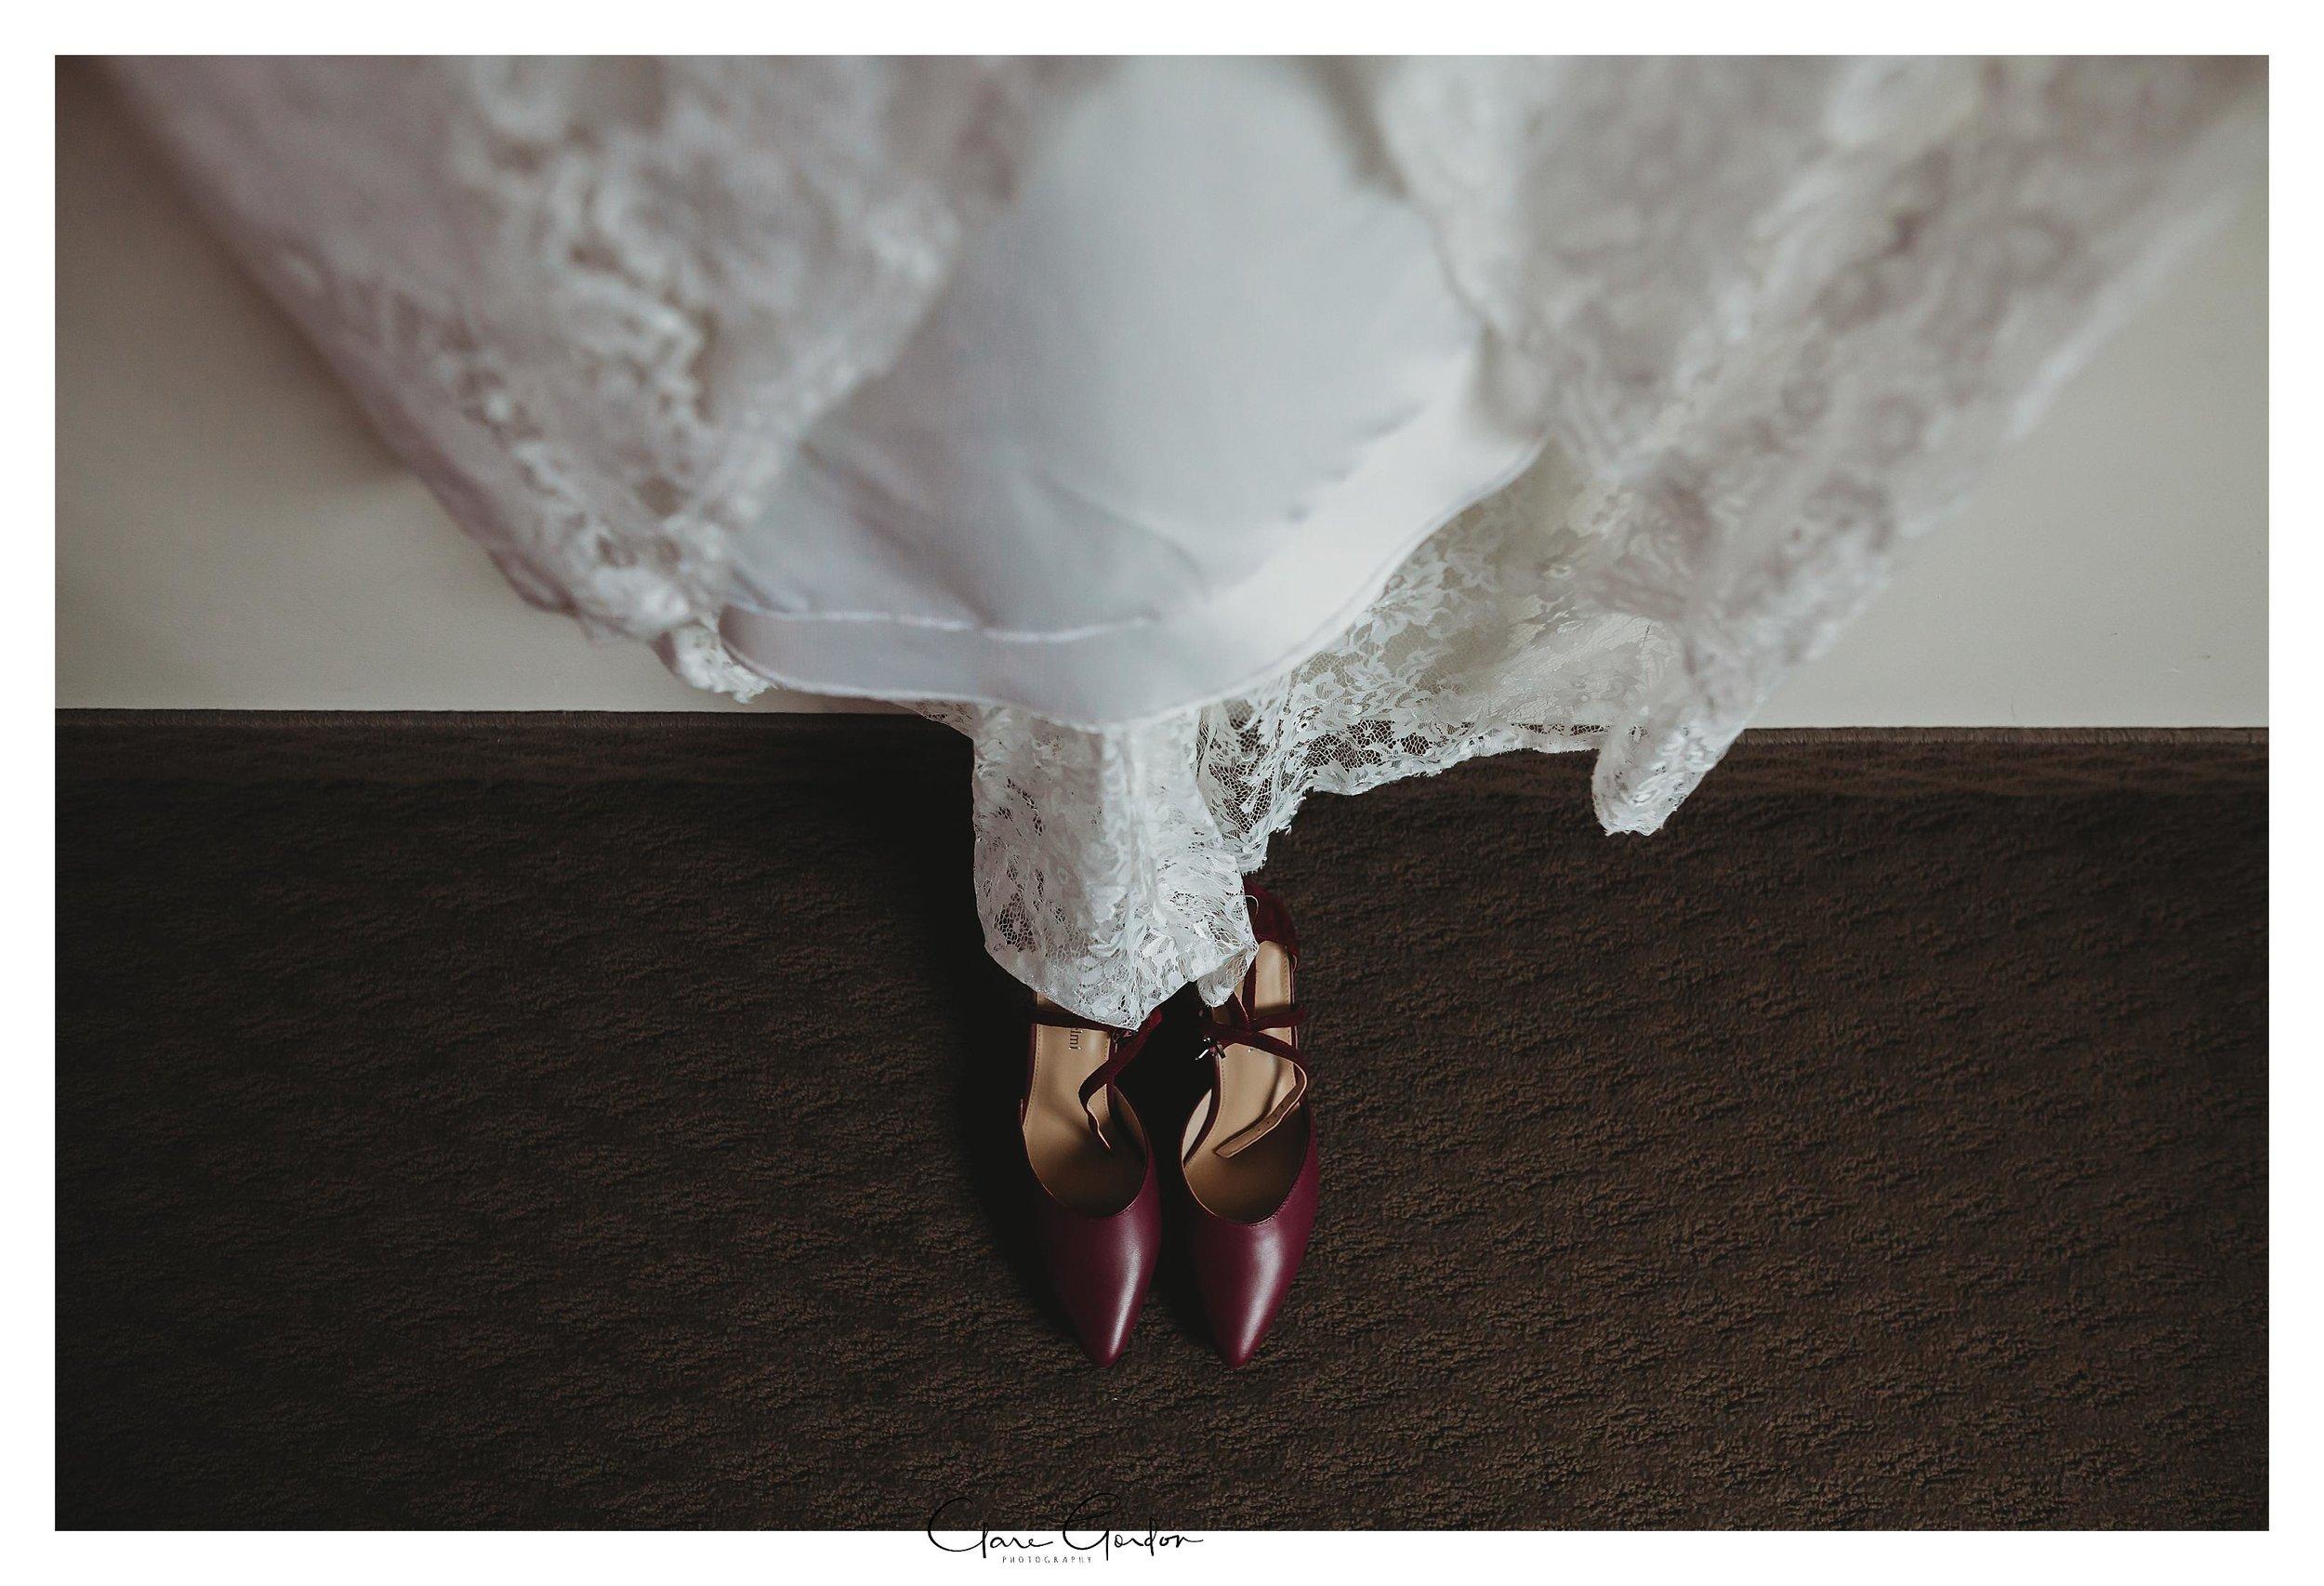 Hamilton-NZ-wedding-photographer-Bride-reflection-Waikato-wedding-photographer-Novotel-Hamilton-Clare-Gordon-photography (7).jpg